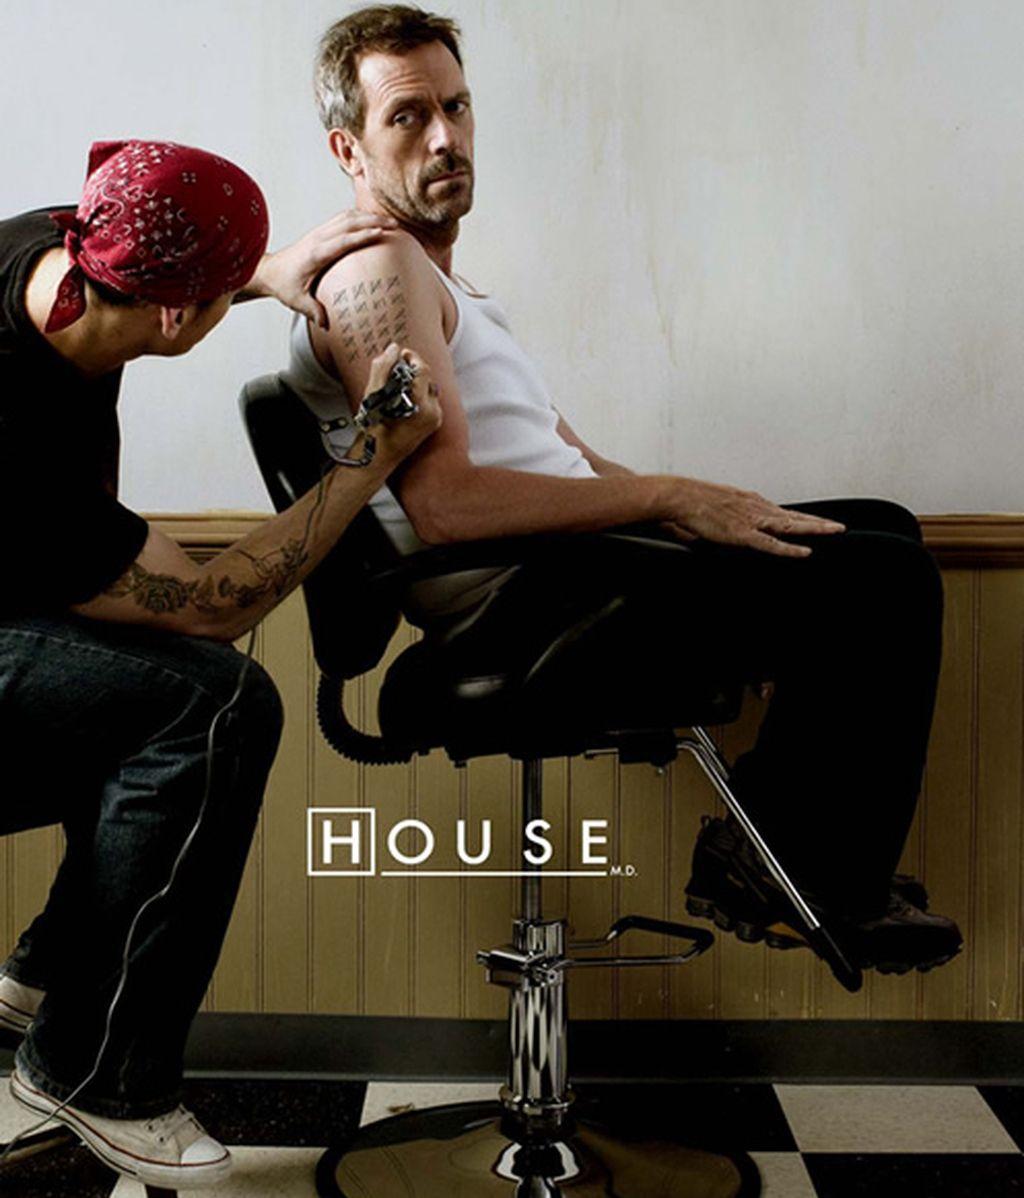 House se pone a 100